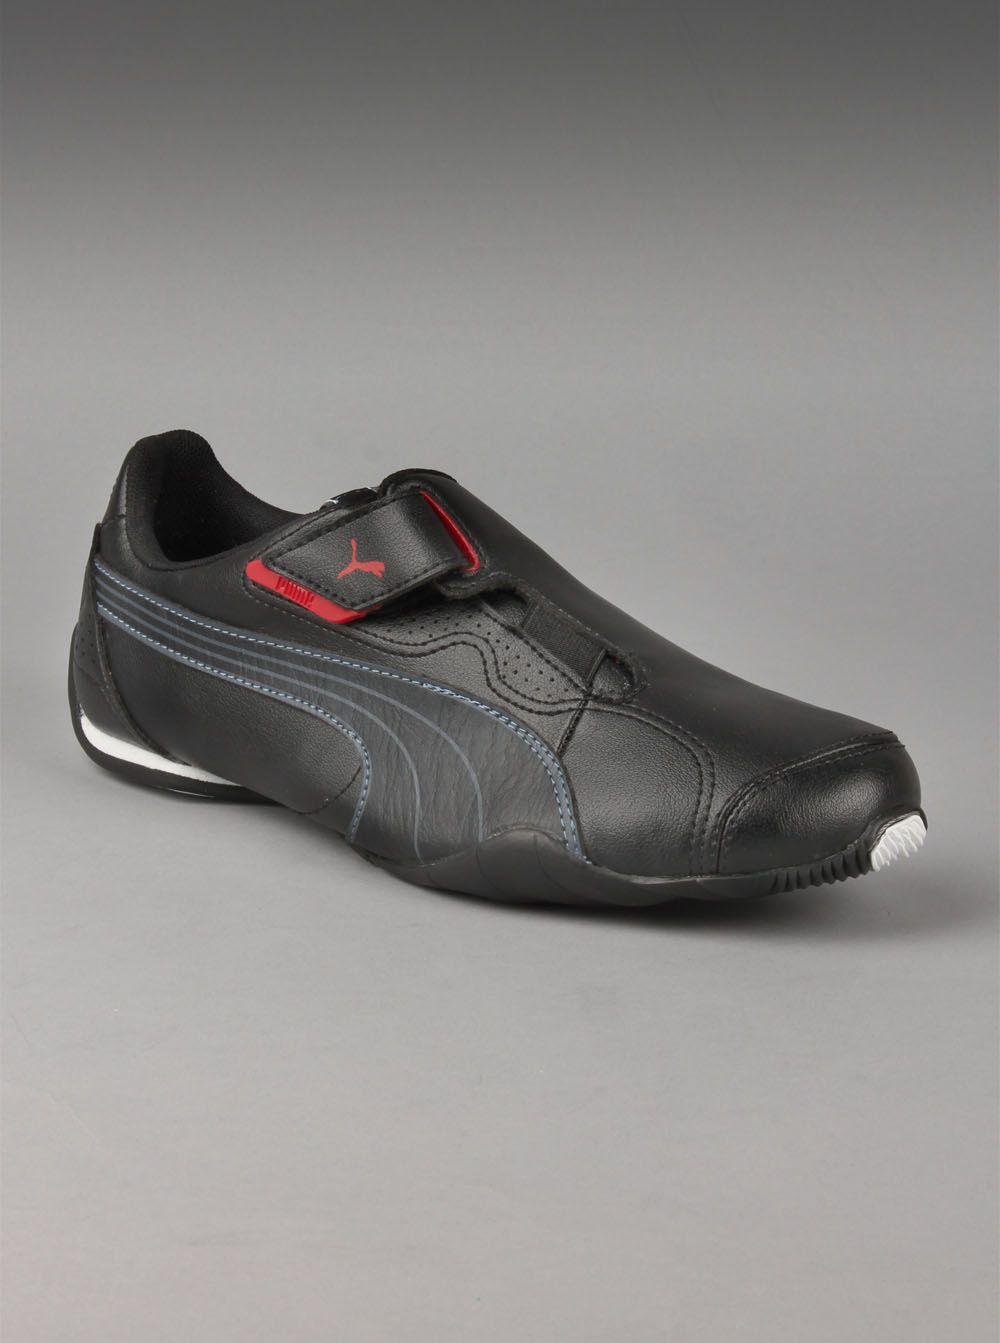 1d026fbaf Puma® Redon Move Mens Casual Shoes in Black. Enjoy the comfort